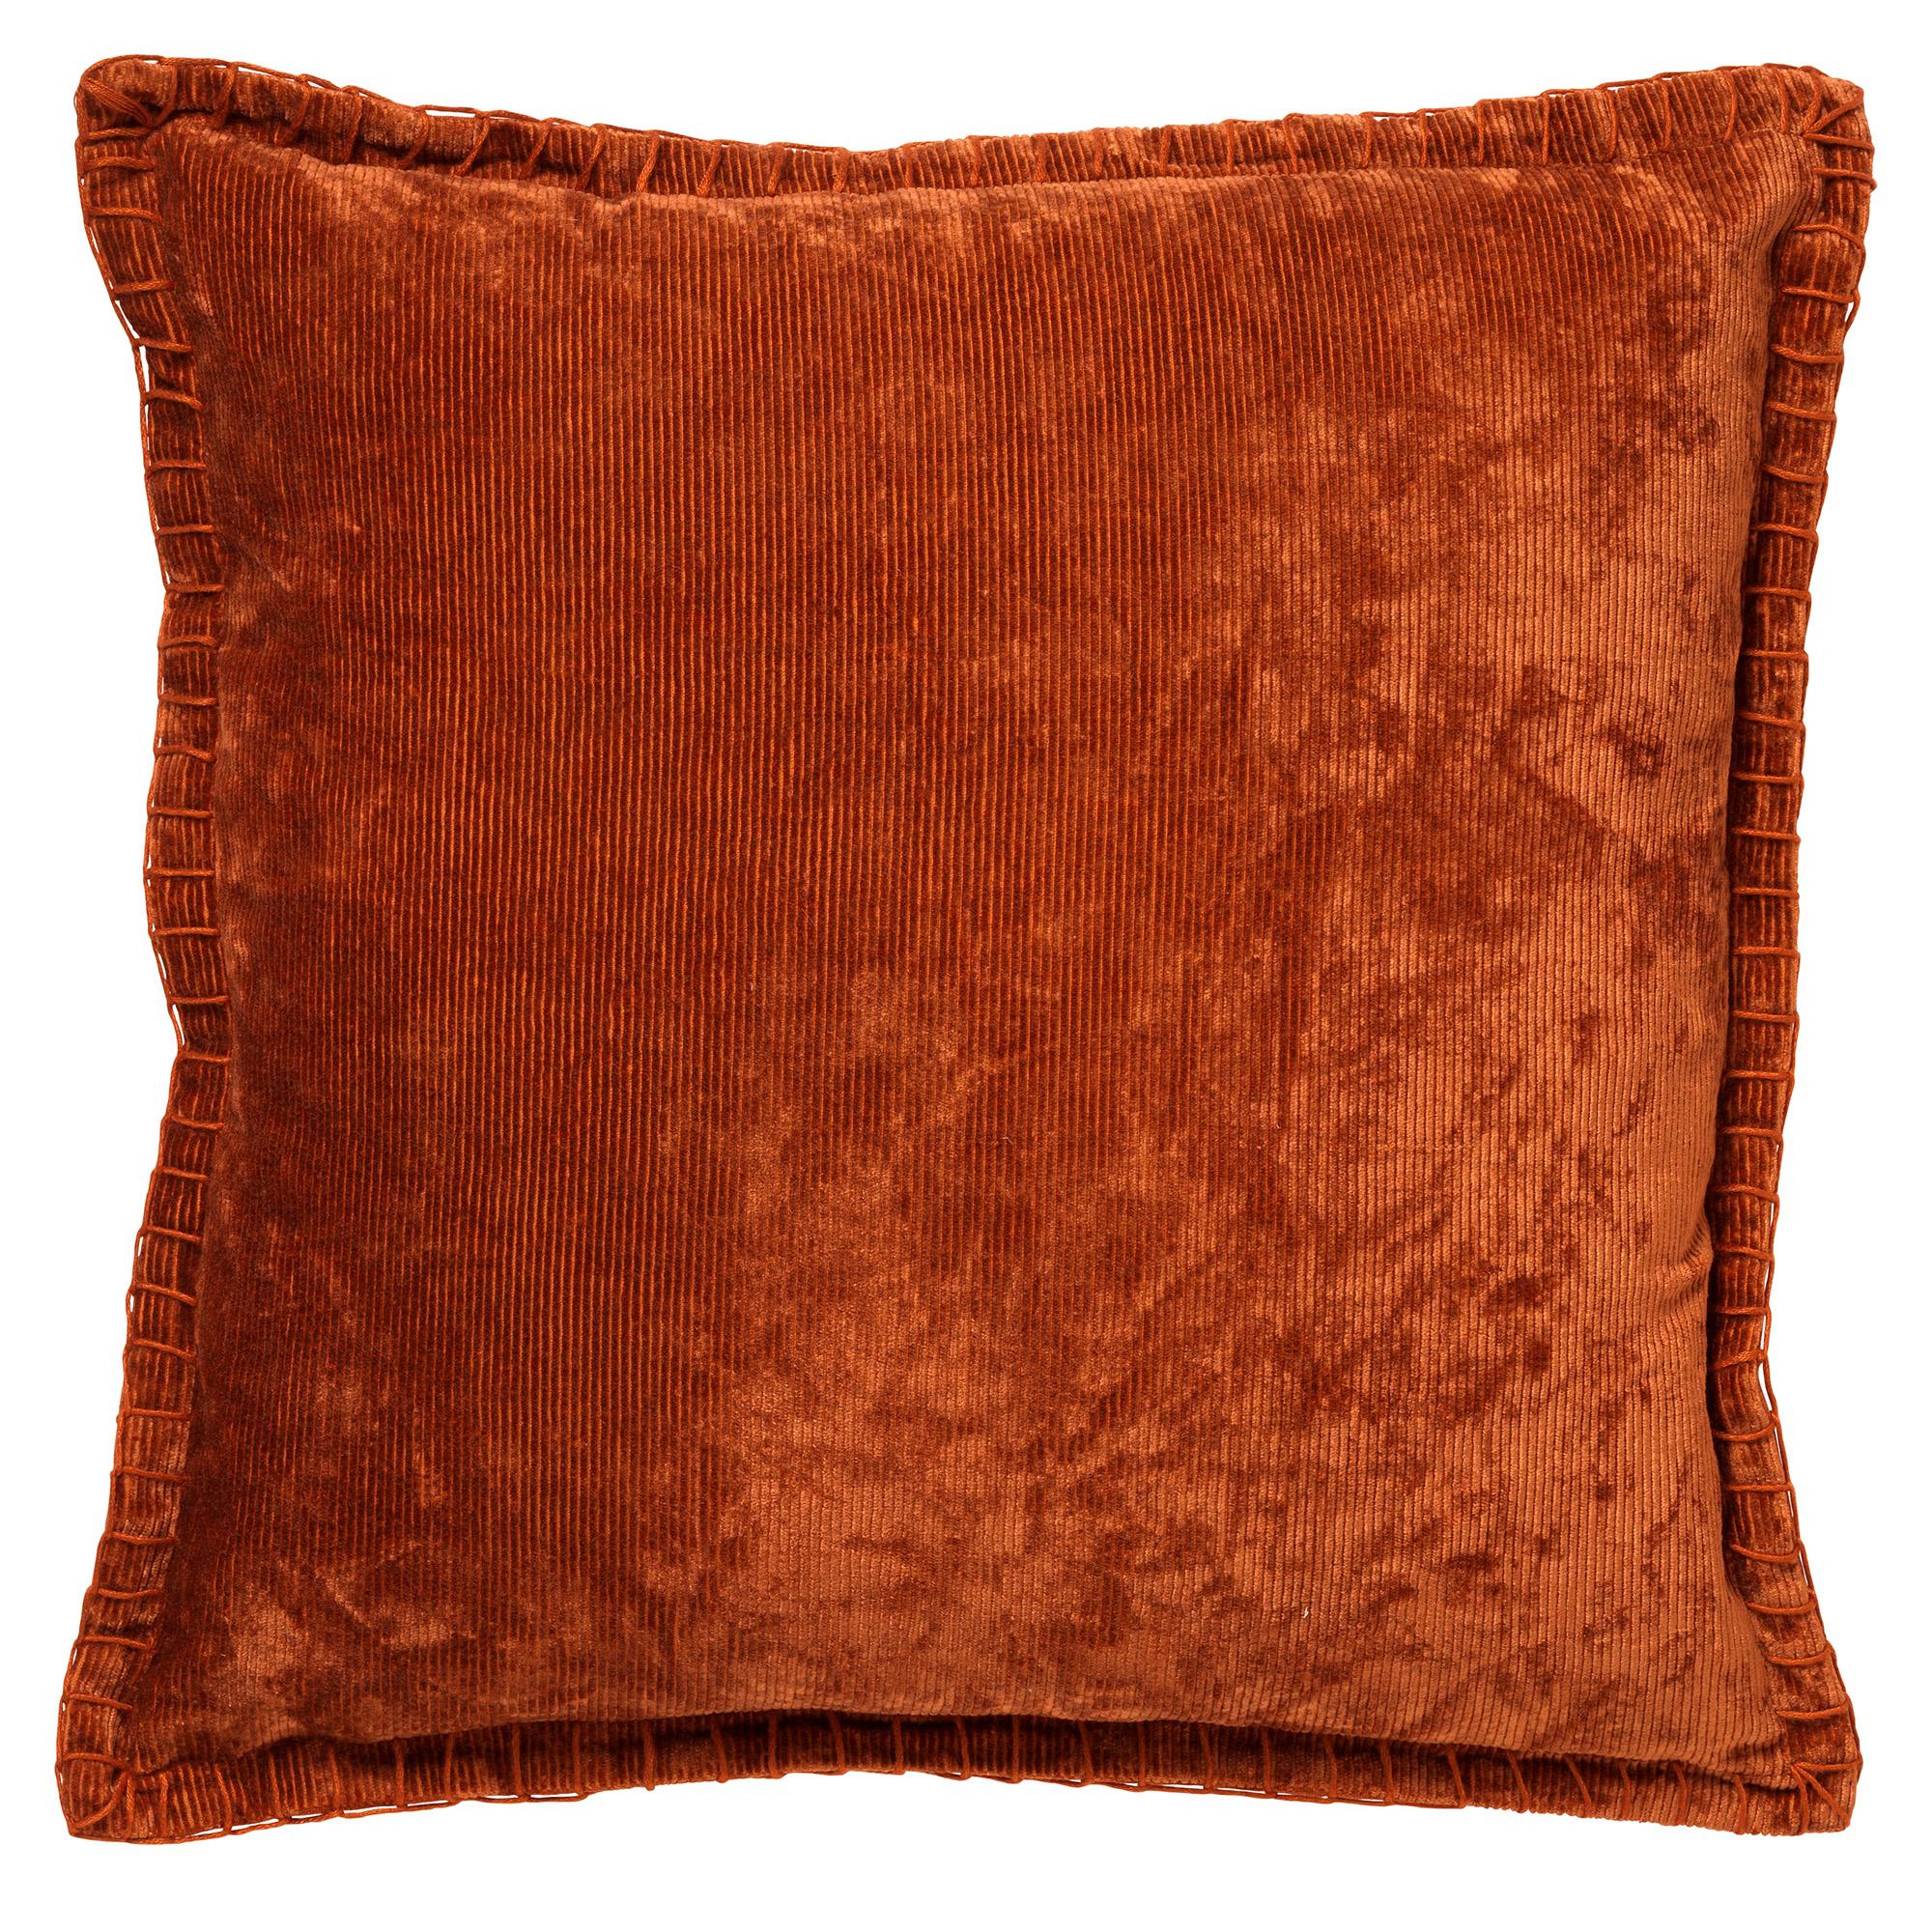 REBEL - Sierkussen velvet 45x45 cm Potters Clay